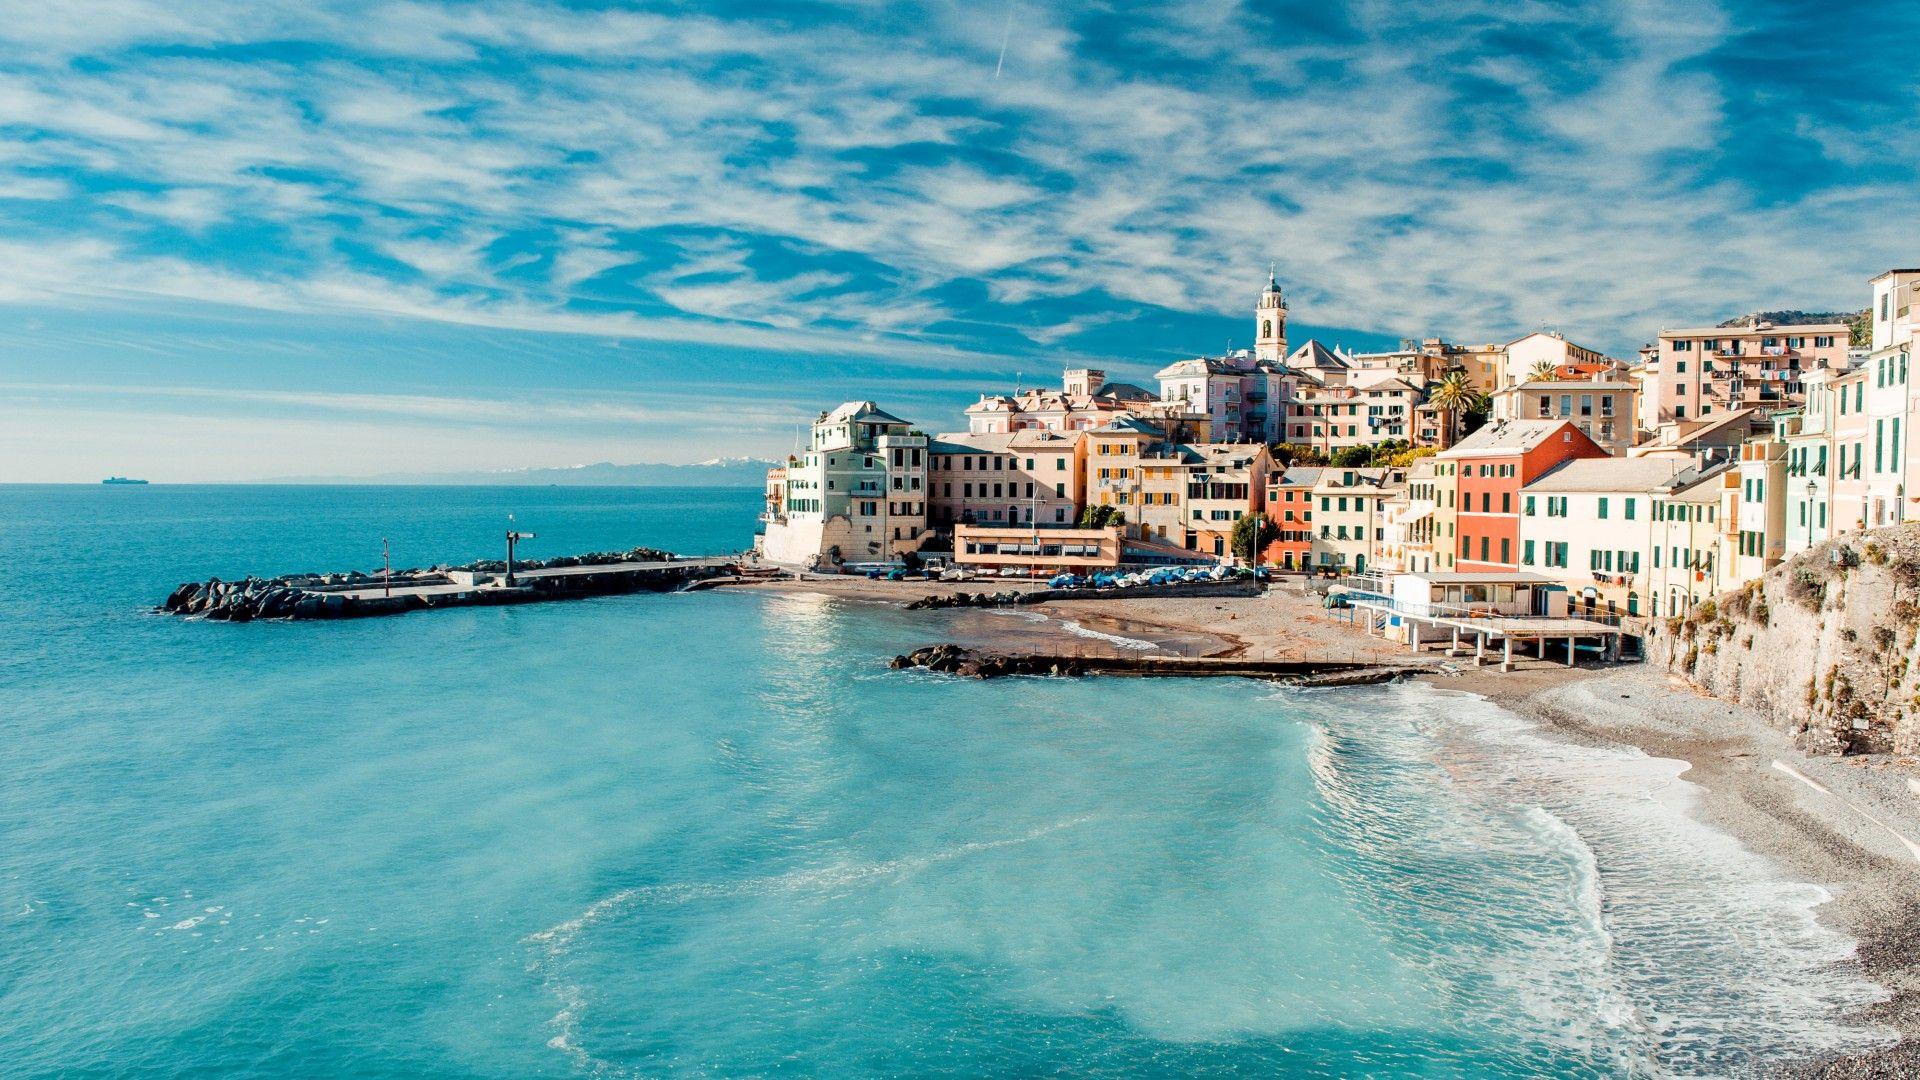 Italy 1080p wallpaper